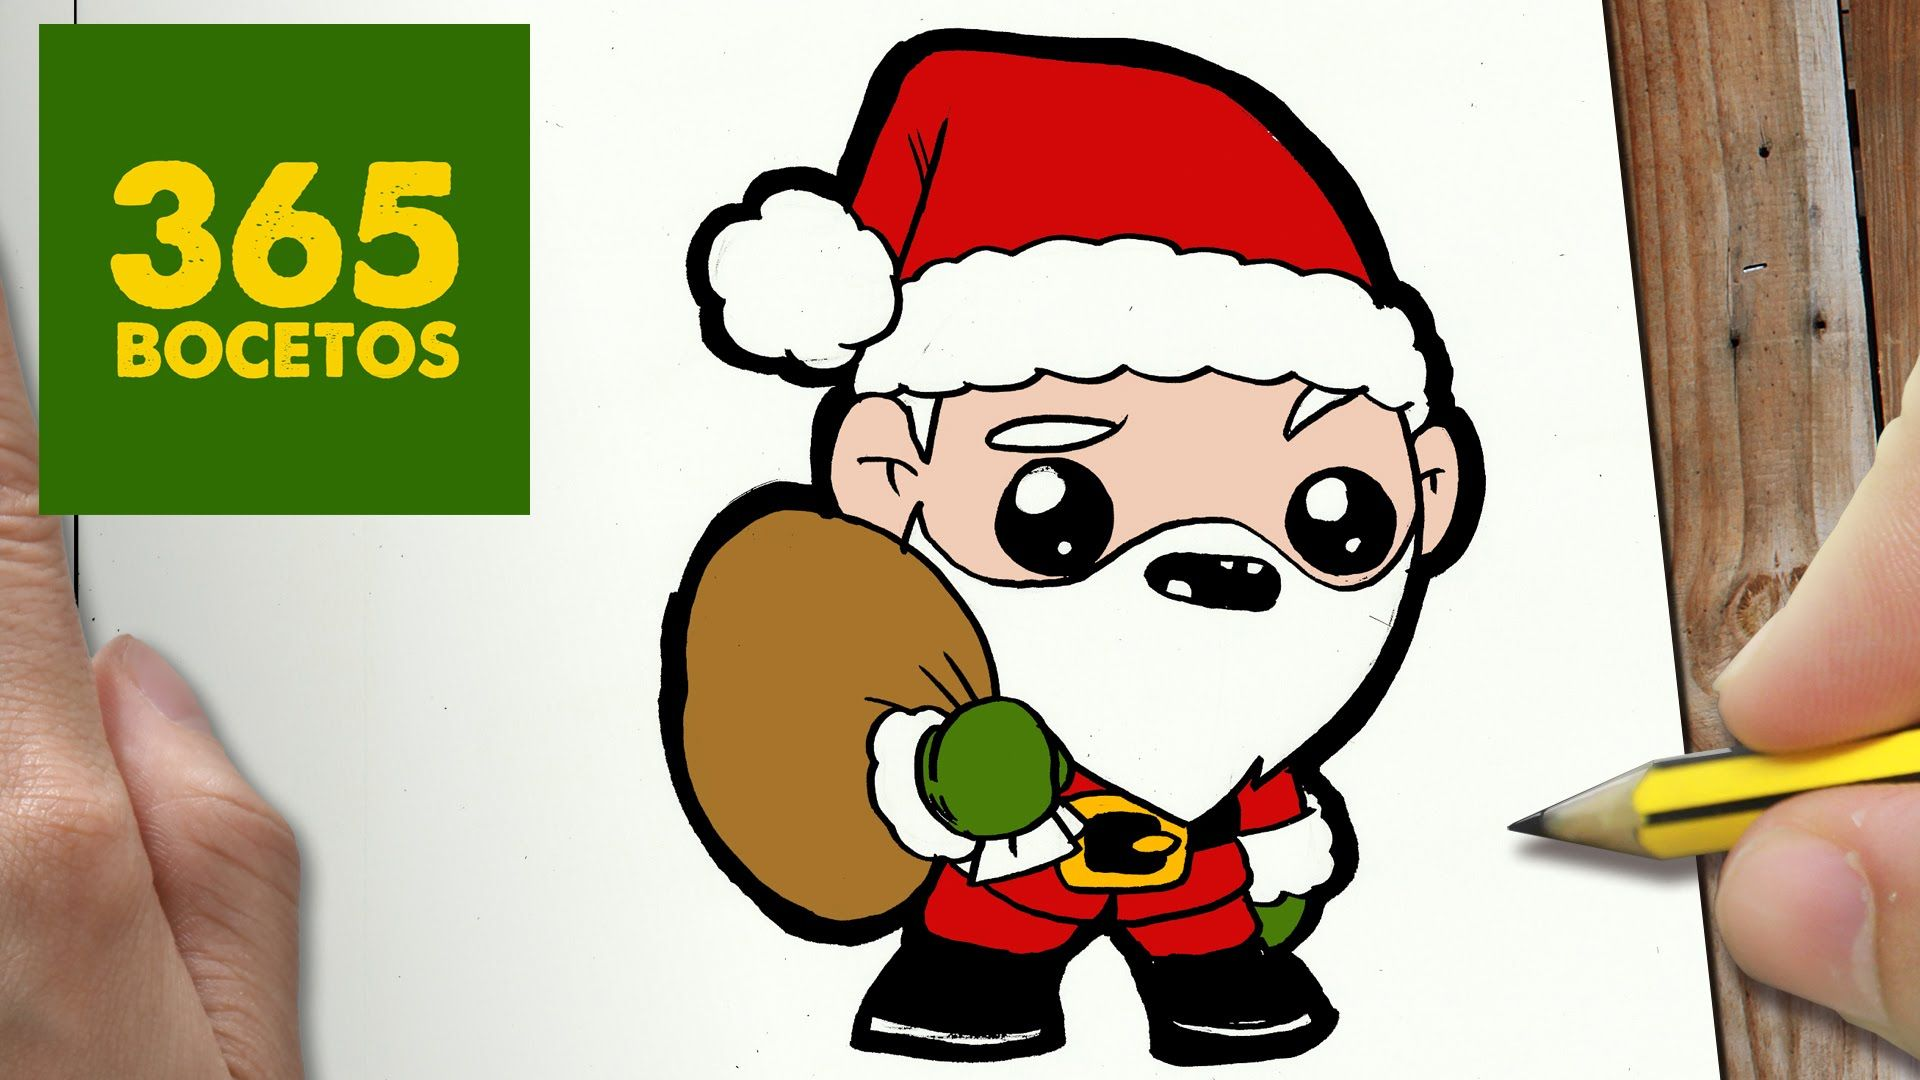 Le Père Noël Dessin Kawaii Dessins Mignons Et Kawaii